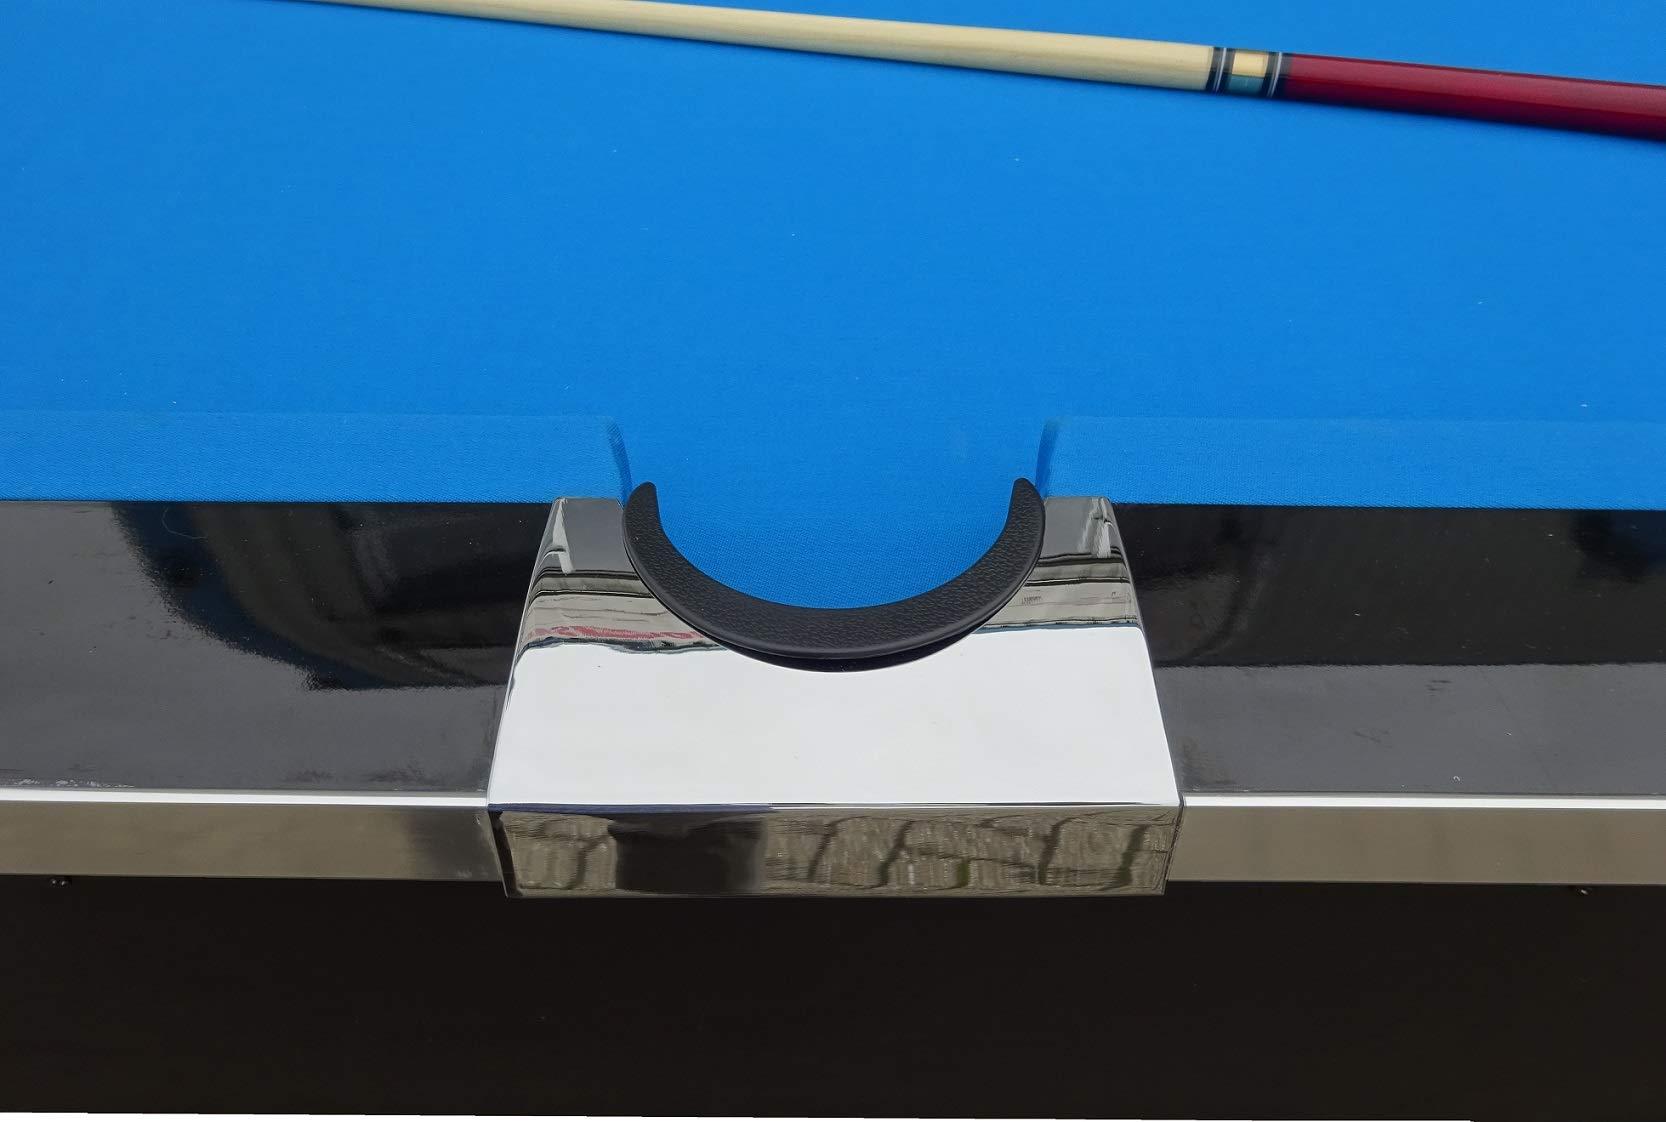 240 x 130 x 79 cm Slate Bed With Accessories Set BuckShot Pool Table Billiard LeMans 8ft Black//Blue 2 Leg